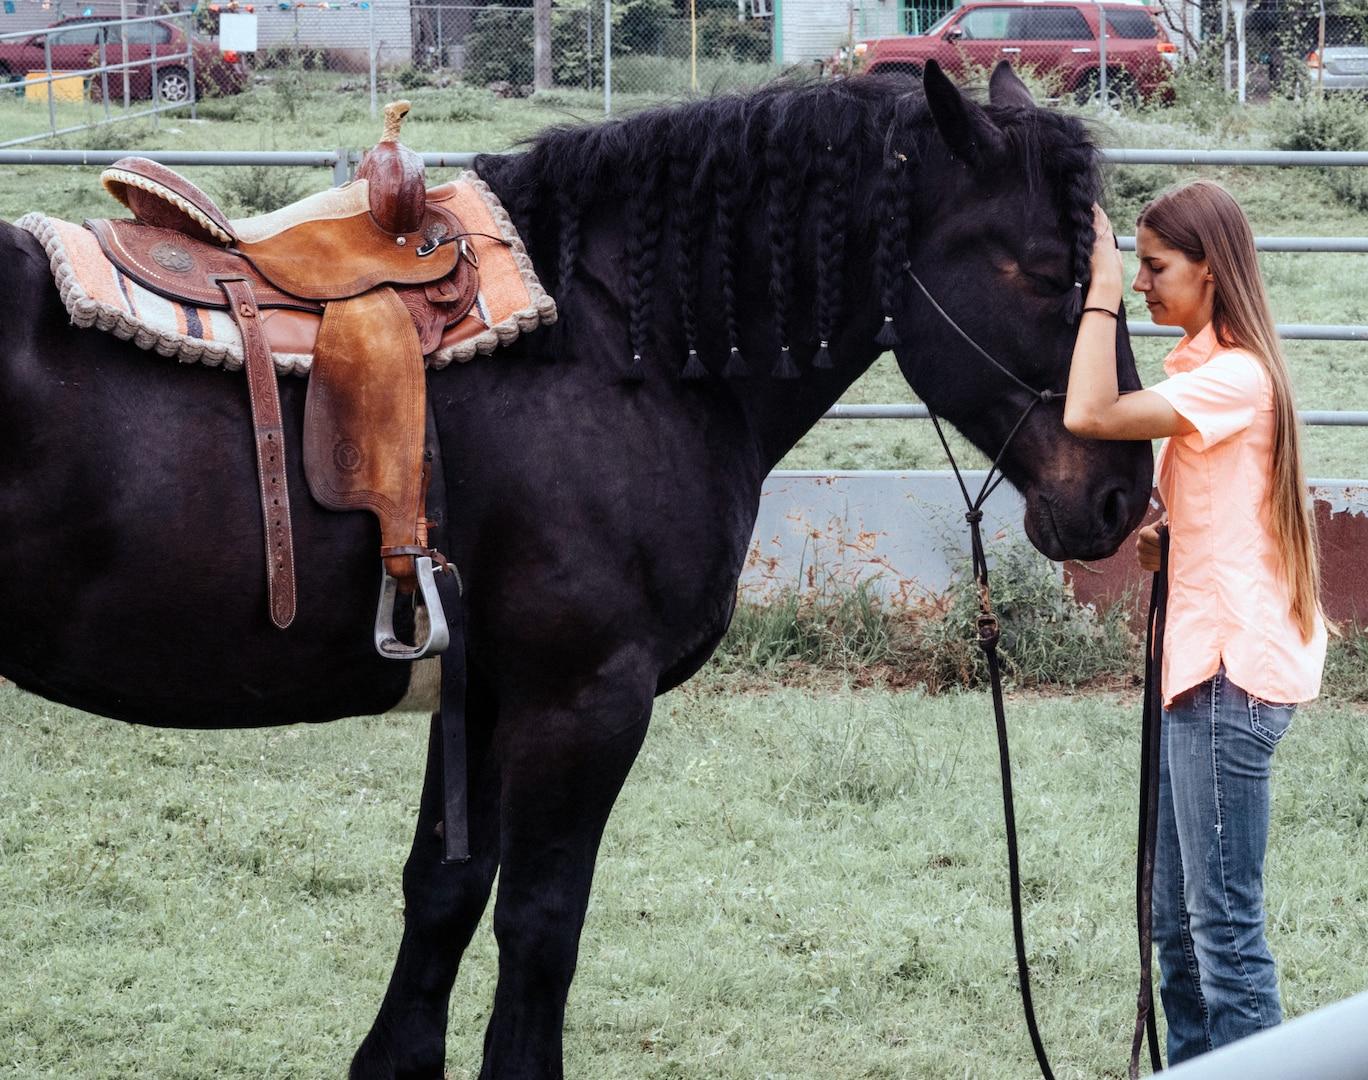 Caroline Stryjewski, an equine trainer for the U.S. Army North Caisson Platoon